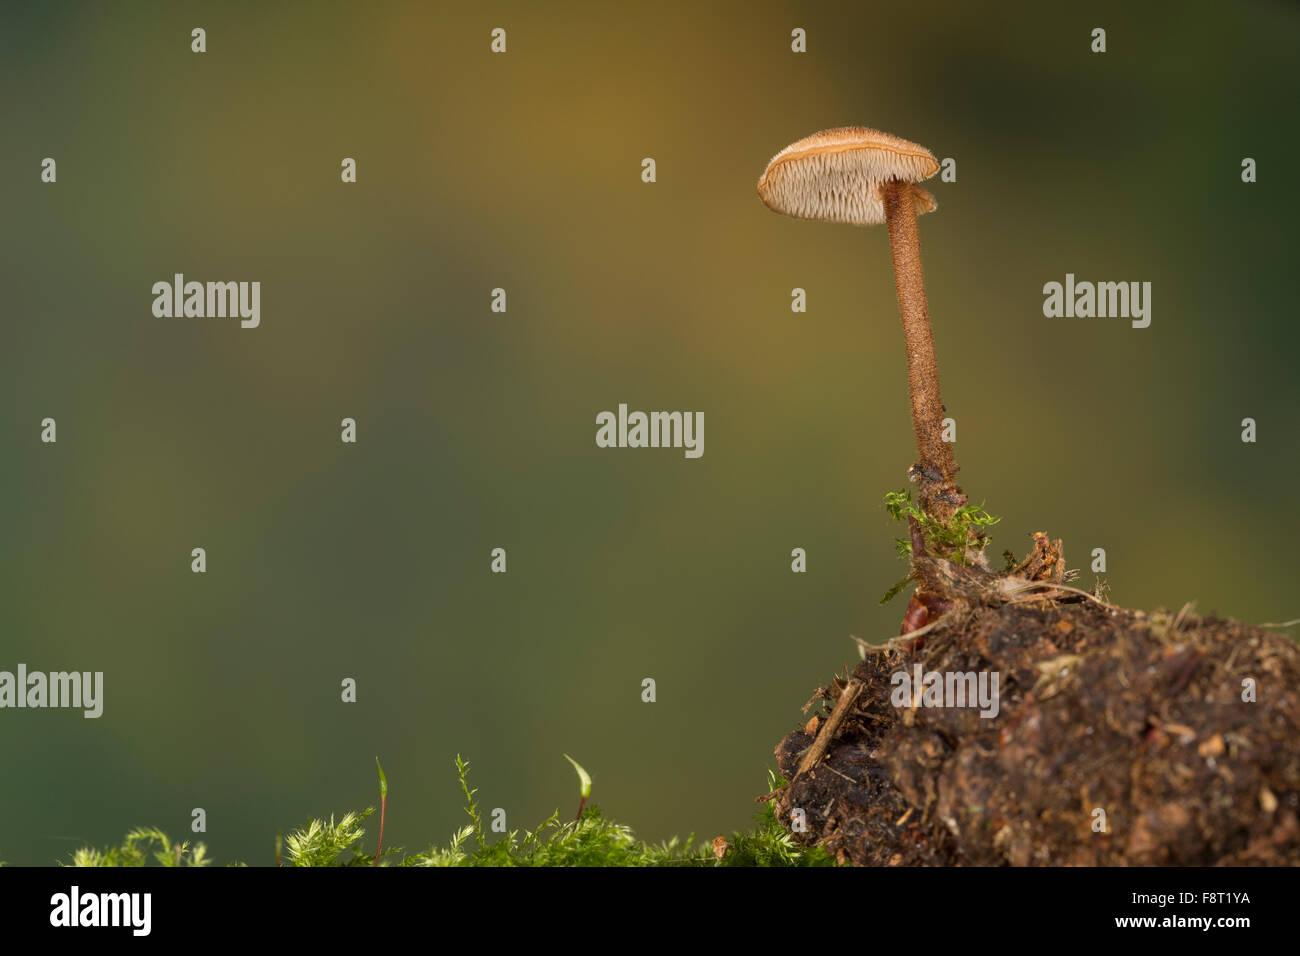 Earpick Fungus, pinecone mushroom, cone tooth, Ohrlöffel-Stacheling, Ohrförmiger Stacheling, Ohrlöffelpilz, - Stock Image